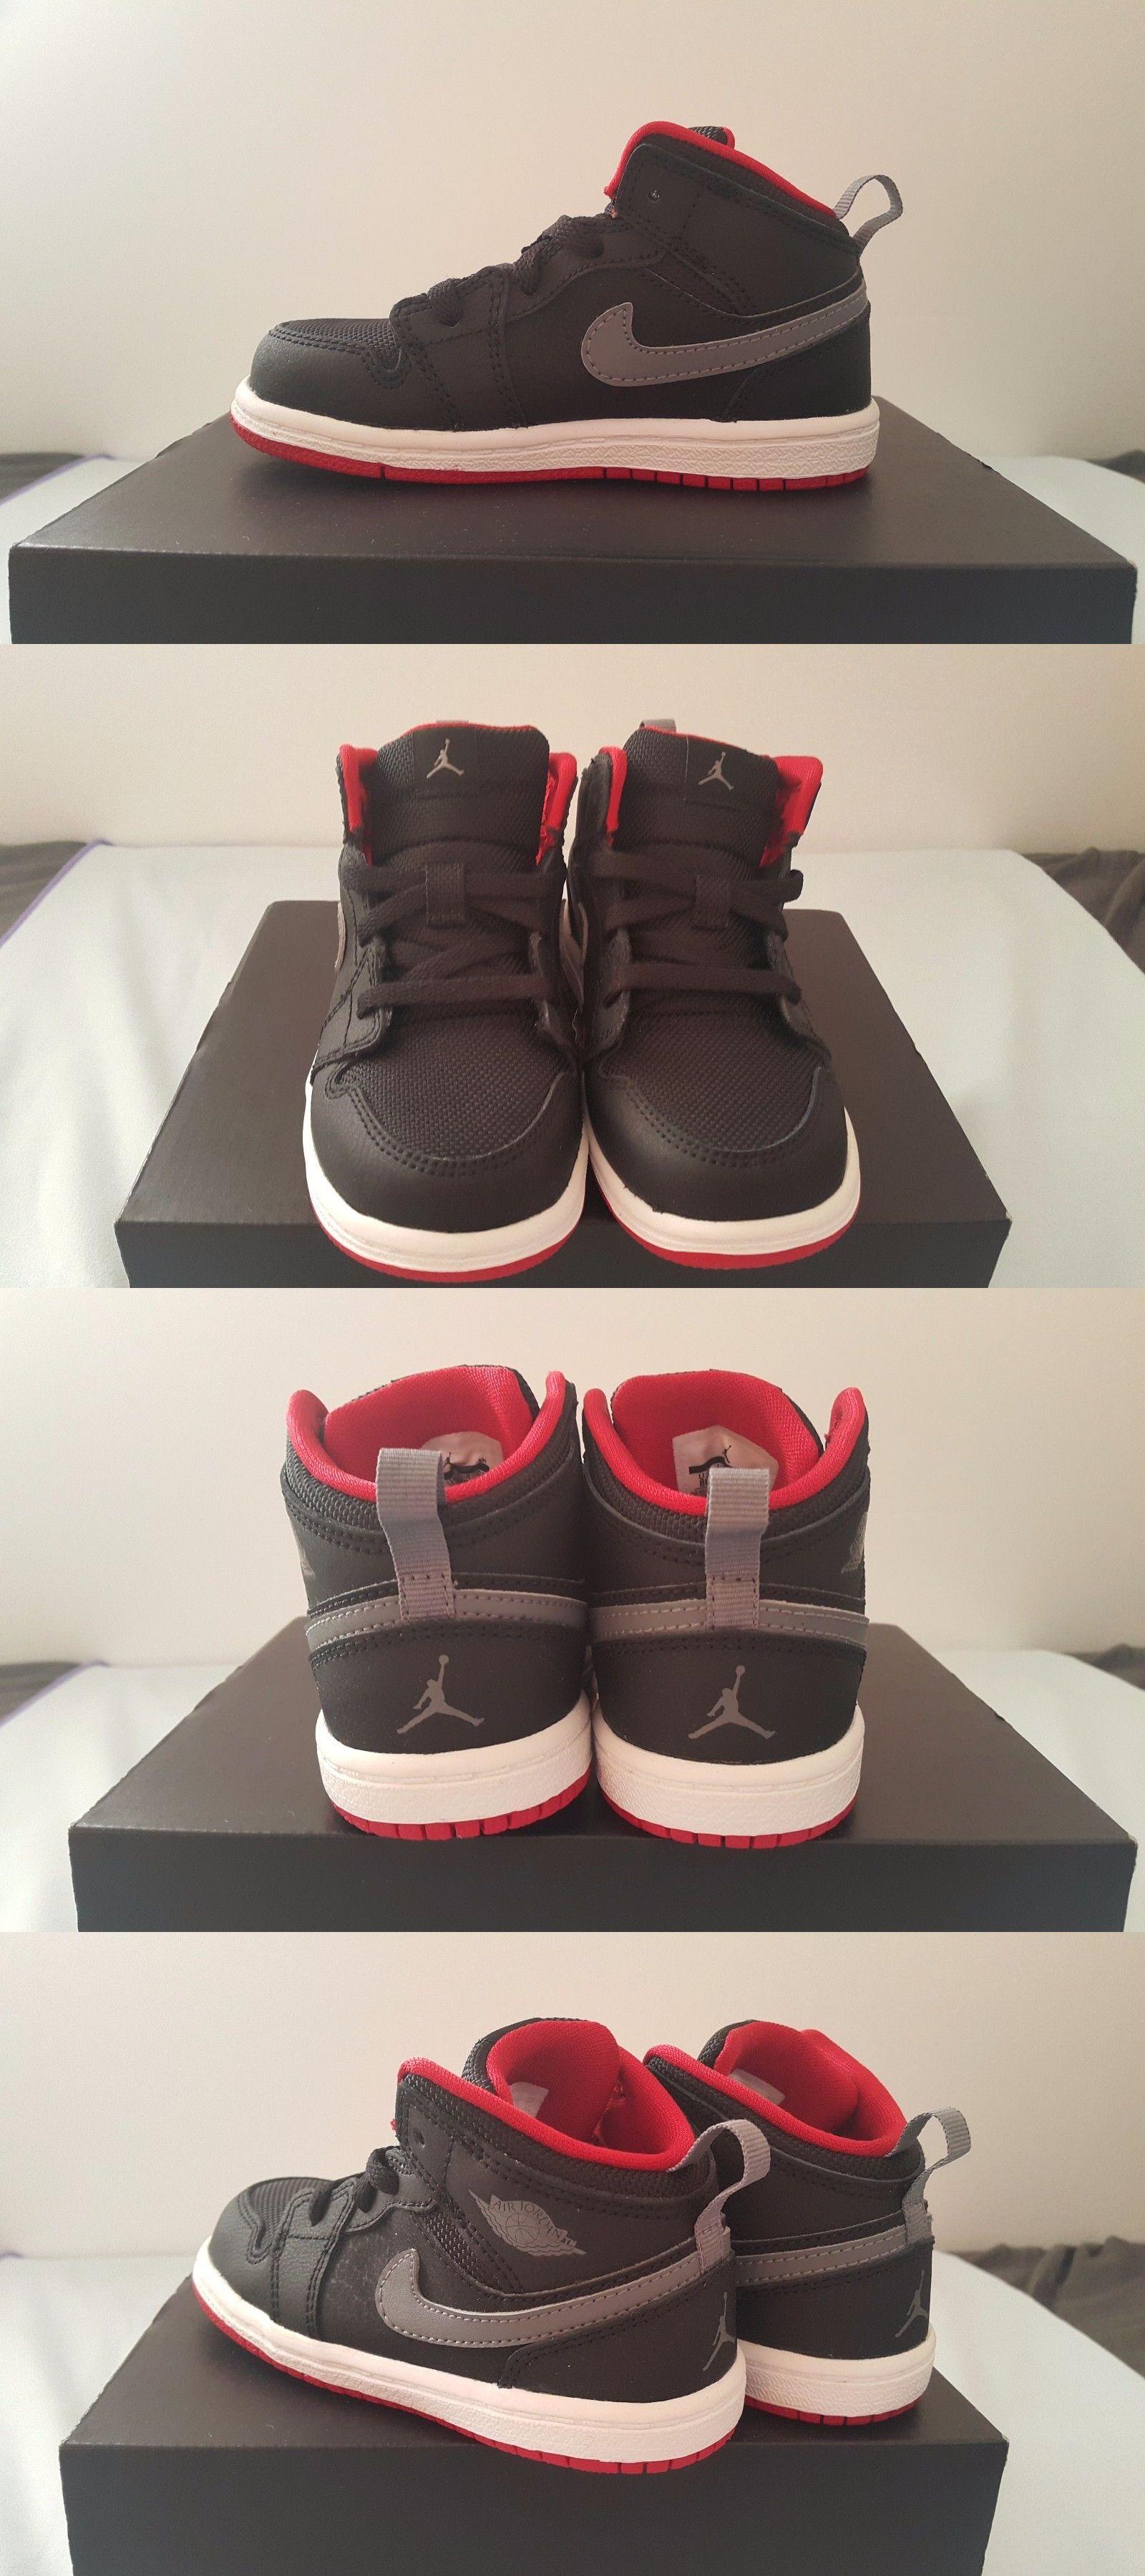 hot sale online c05a4 83b41 Baby Shoes 147285: New - Nike Air Jordan 1 Mid Bt Shoes ...